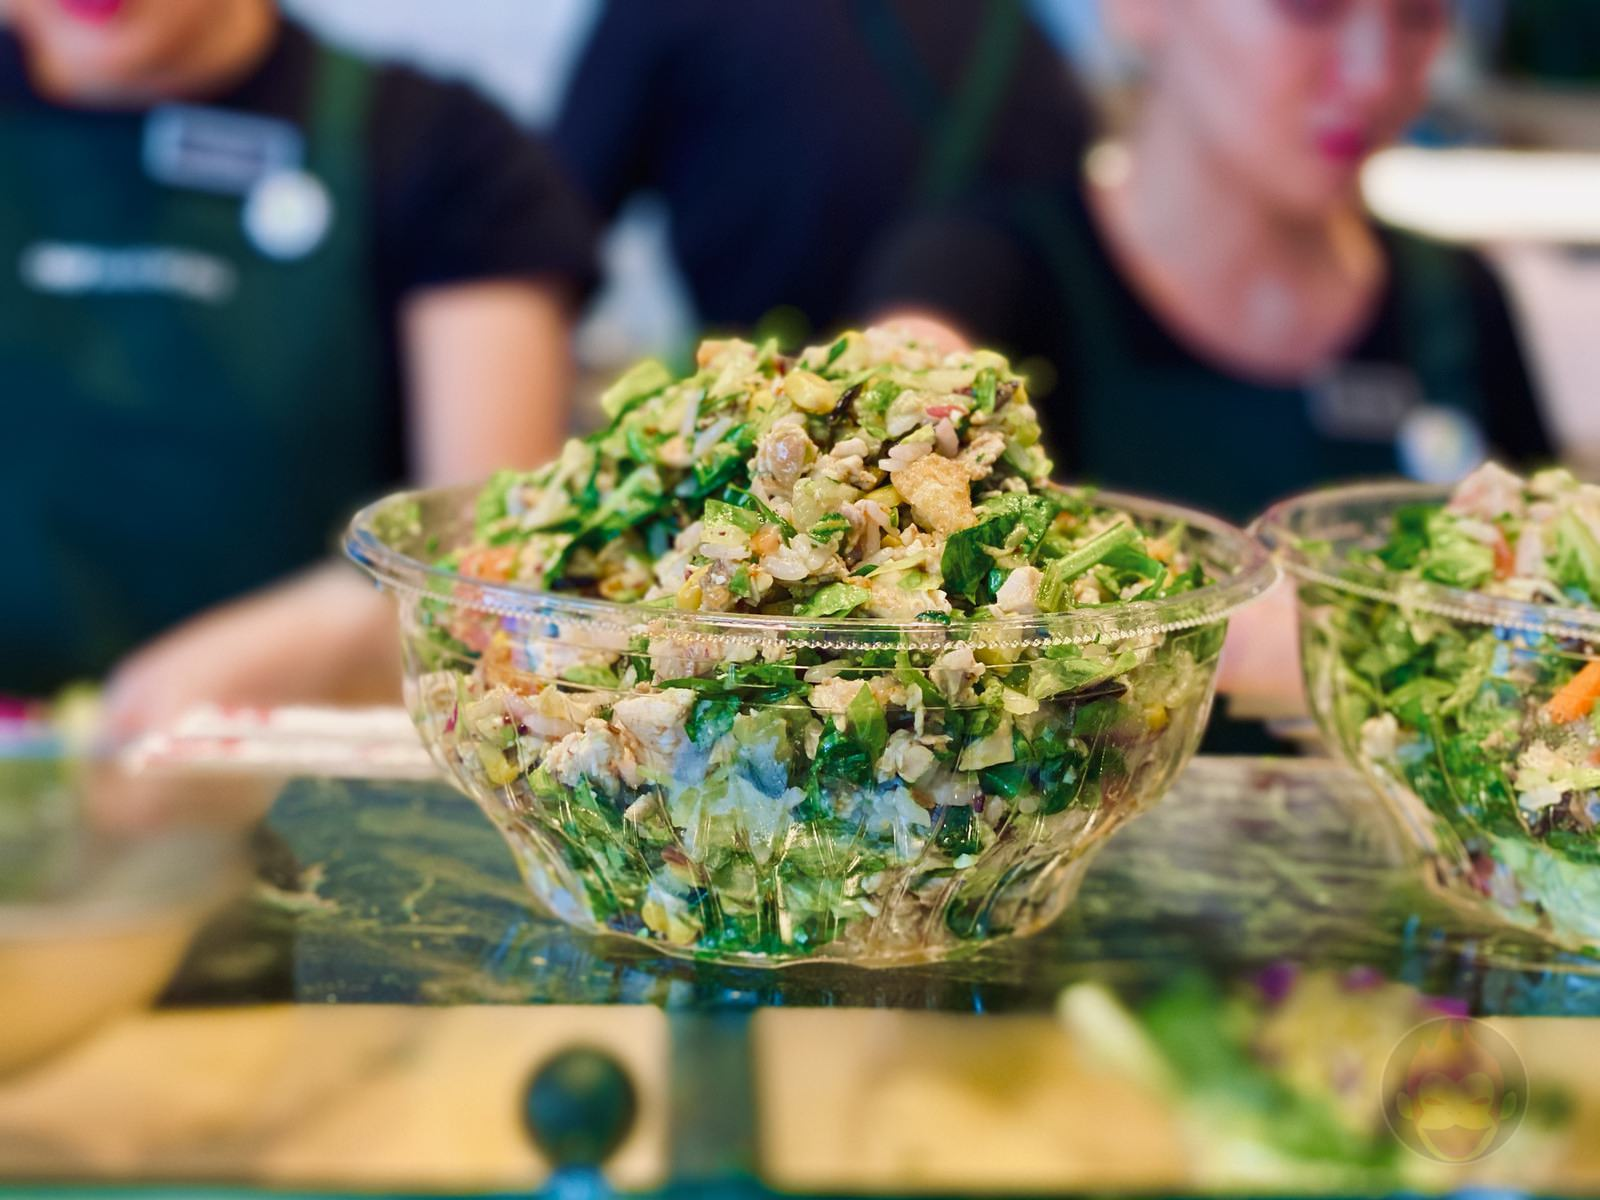 Crisp-Salad-Works-Grandberry-Park-Minamimachida-04.jpeg